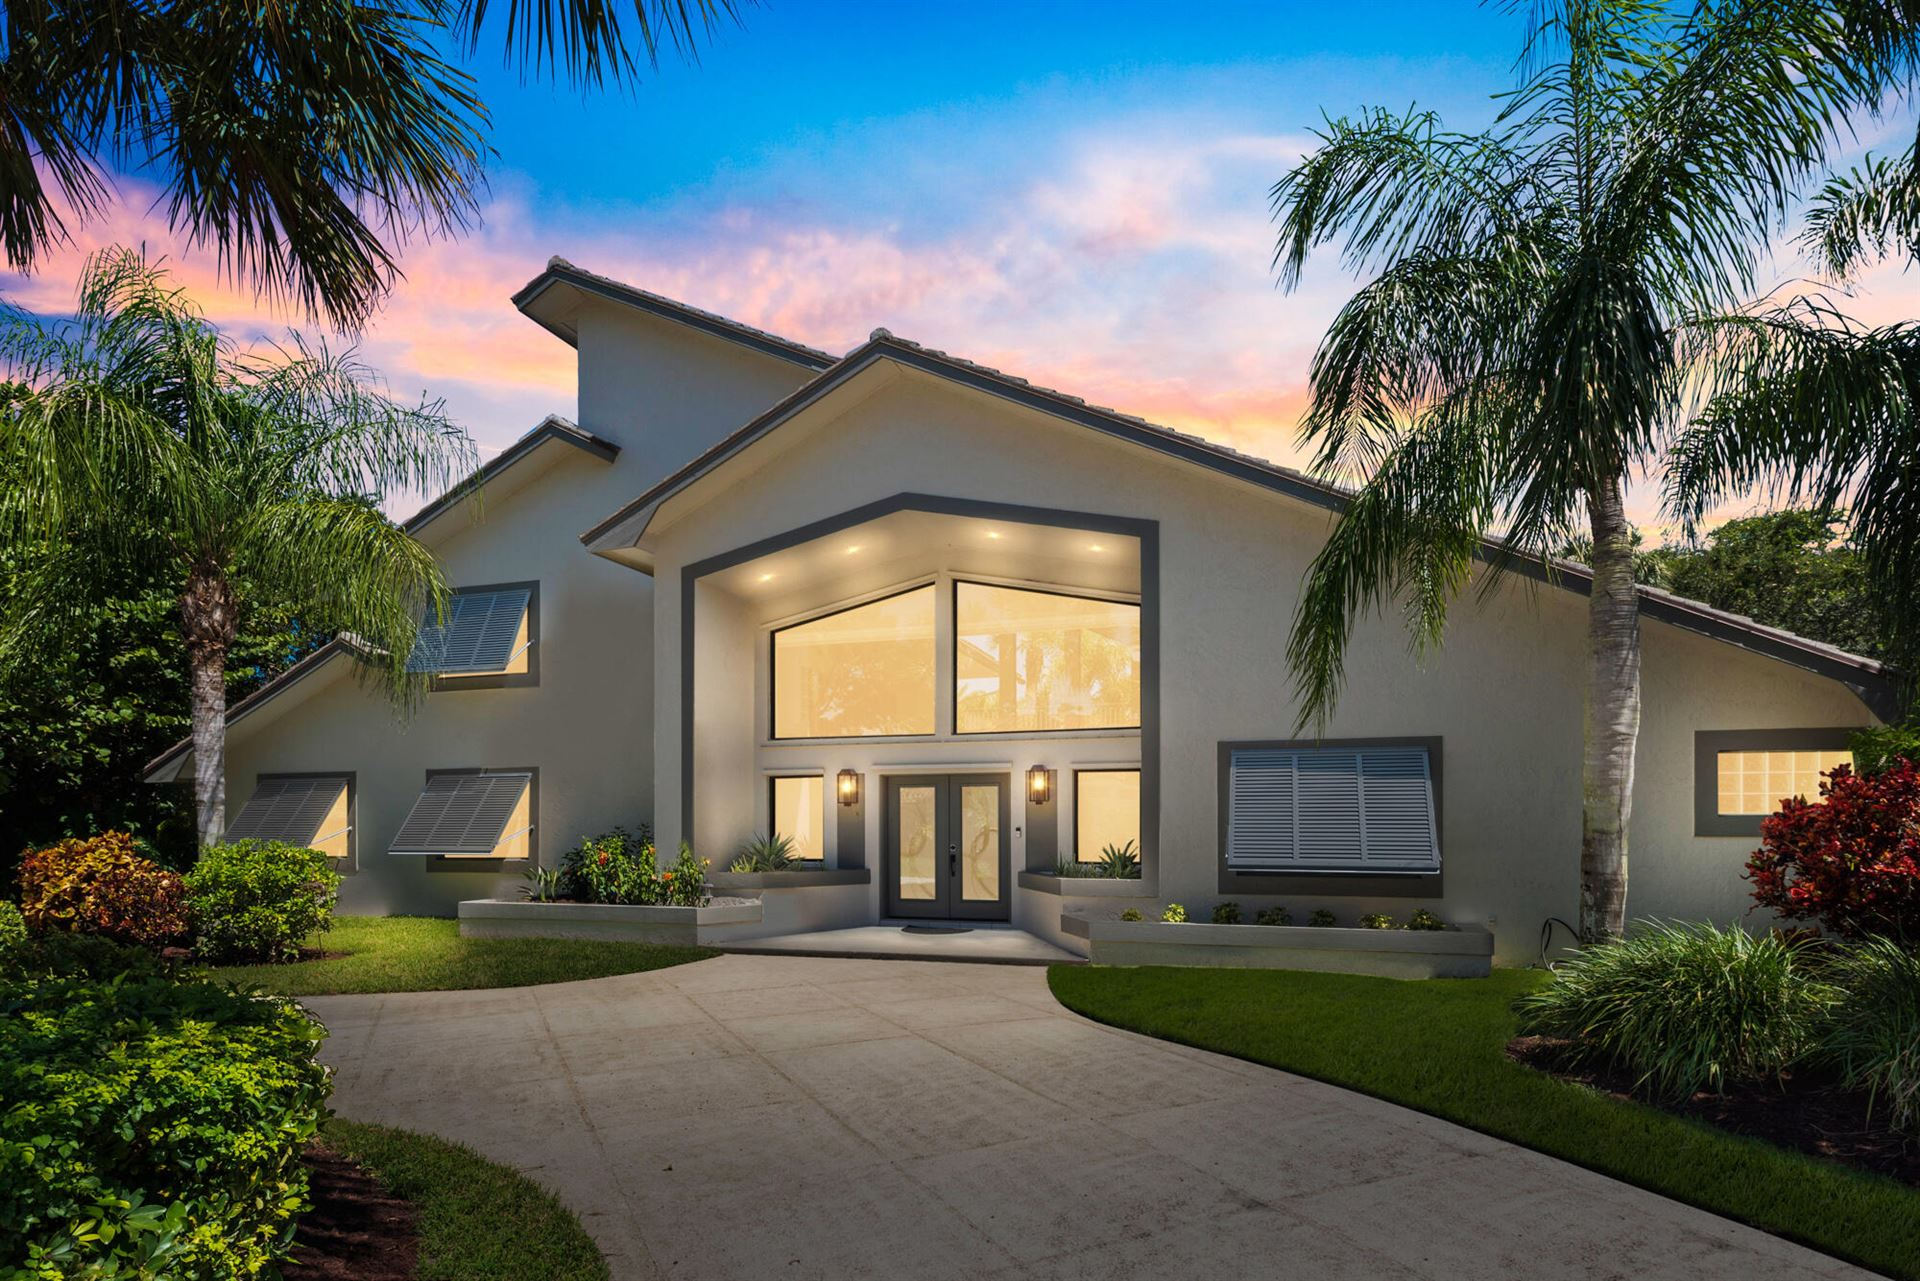 Photo of 9136 SE Mystic Cove Terrace, Hobe Sound, FL 33455 (MLS # RX-10748478)